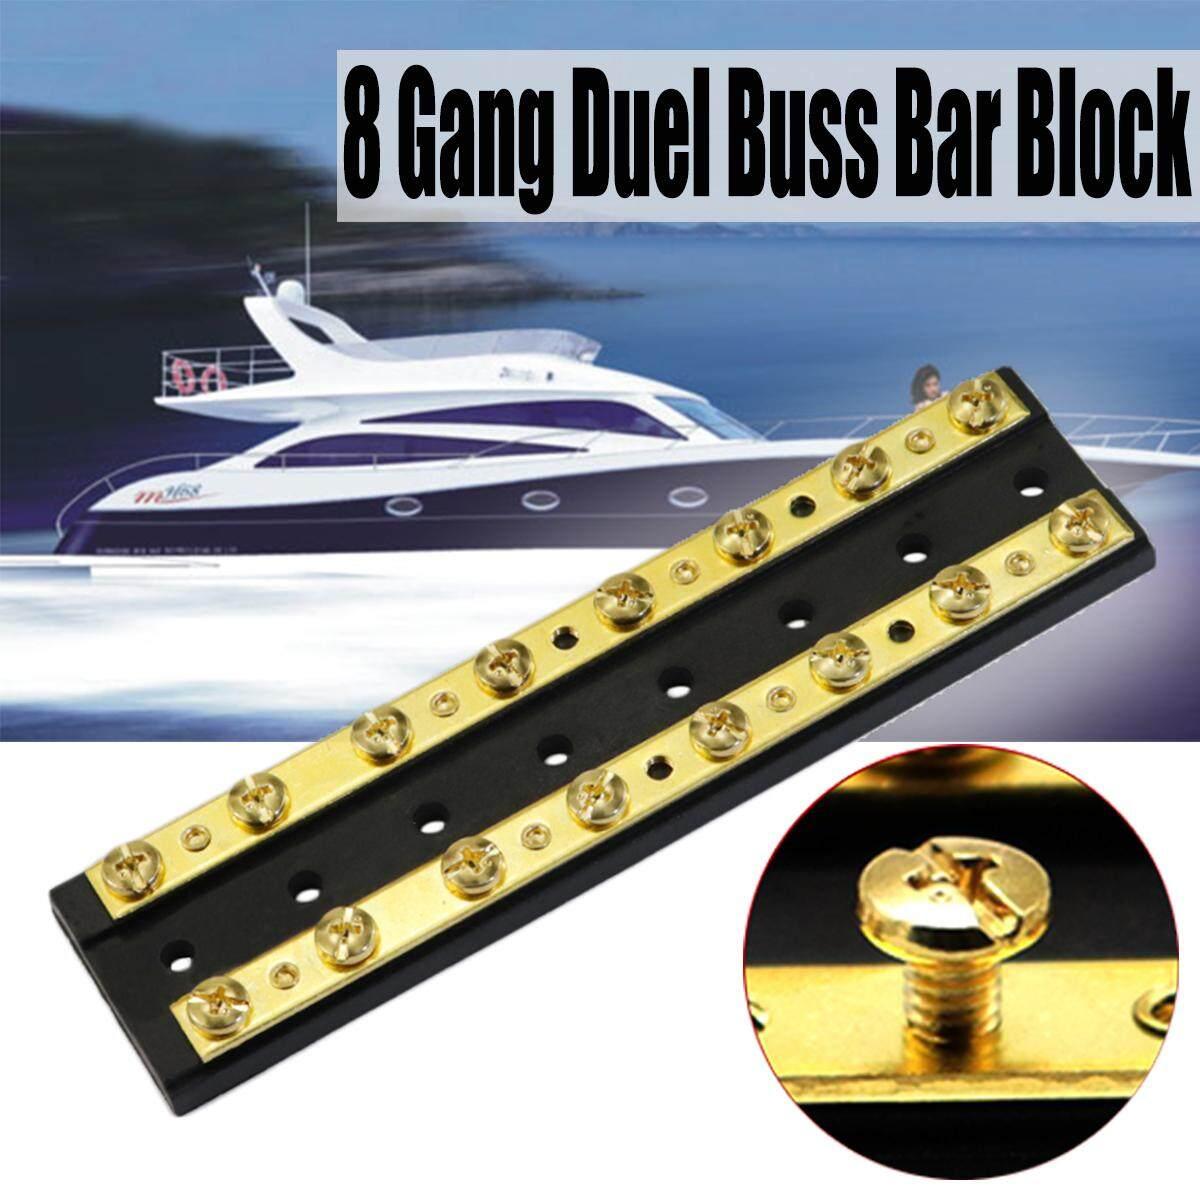 【free Shipping + Flash Deal】marine Boat Rv Brass 4 6 8 Gang Duel Buss Bar Block Positive & Negative (f3883-8p) By Paidbang.